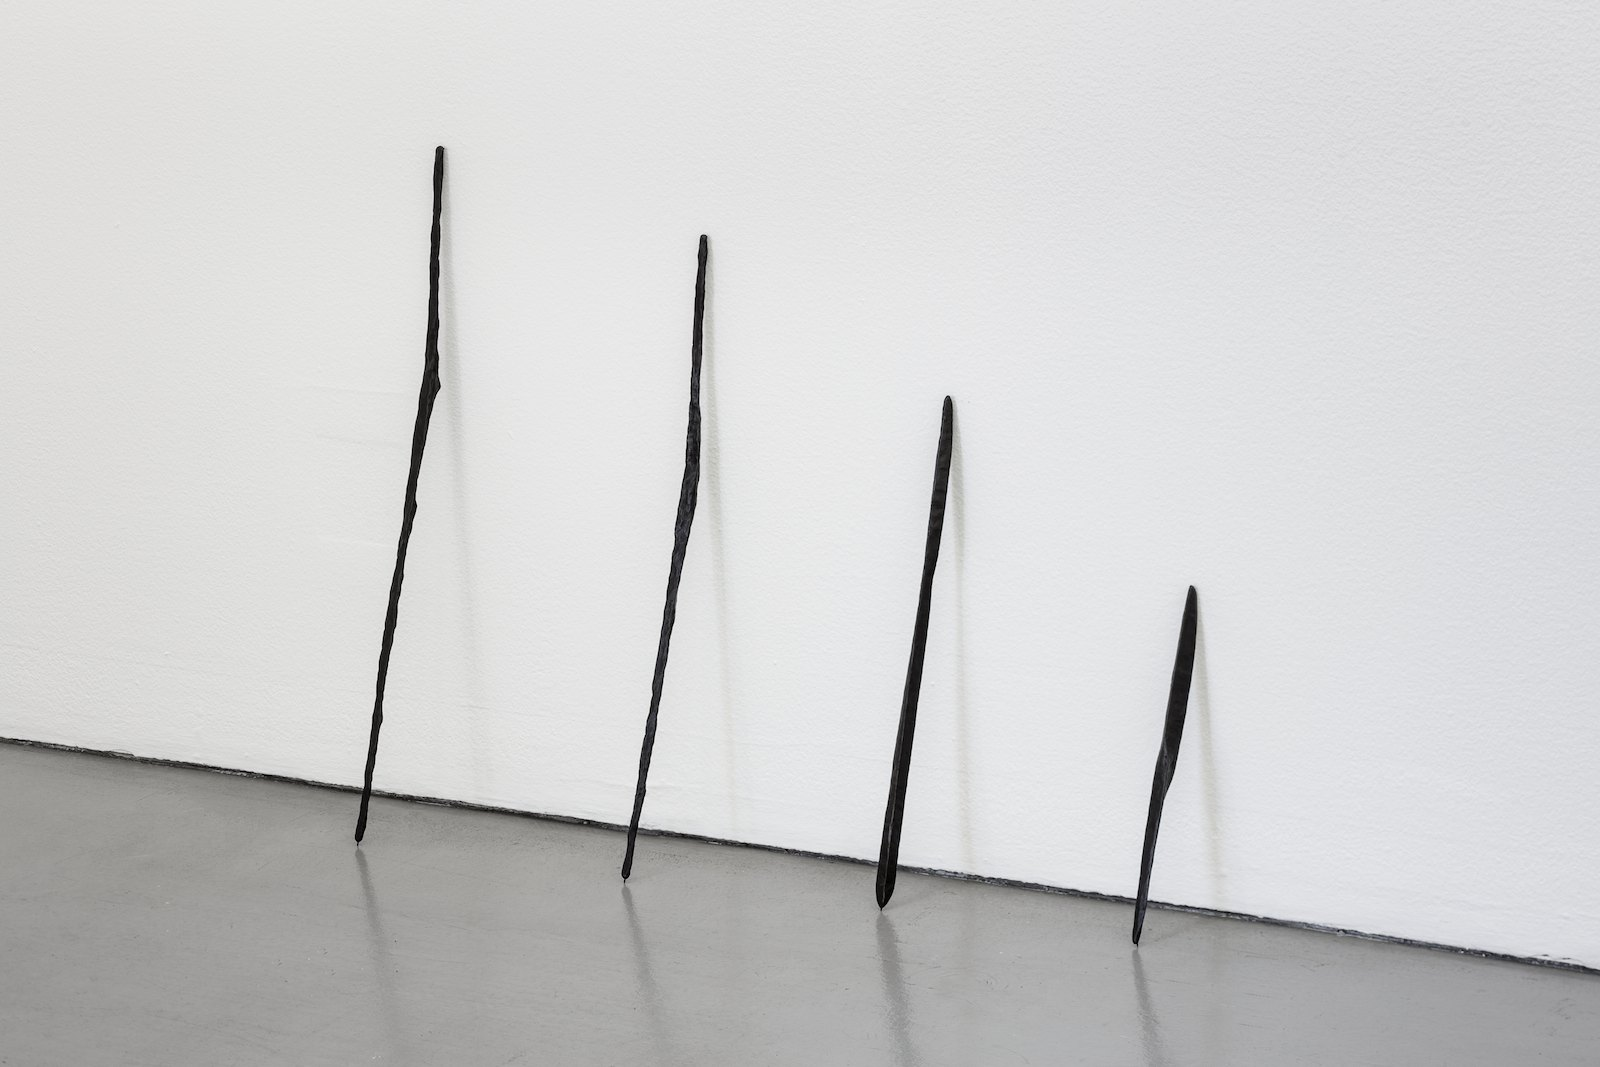 Jan Groth, Skulptur V, 1991, bronze, 63,5 cm, Ed. 6. Skulptur II, 1991, Bronze, 56,5 cm, Ed. 6. Sculpture IX 95, 1995, Bronze, 45 cm, Ed. 6. Sculpture XVII 95, 1995, Bronze, 31 cm, Ed. 6